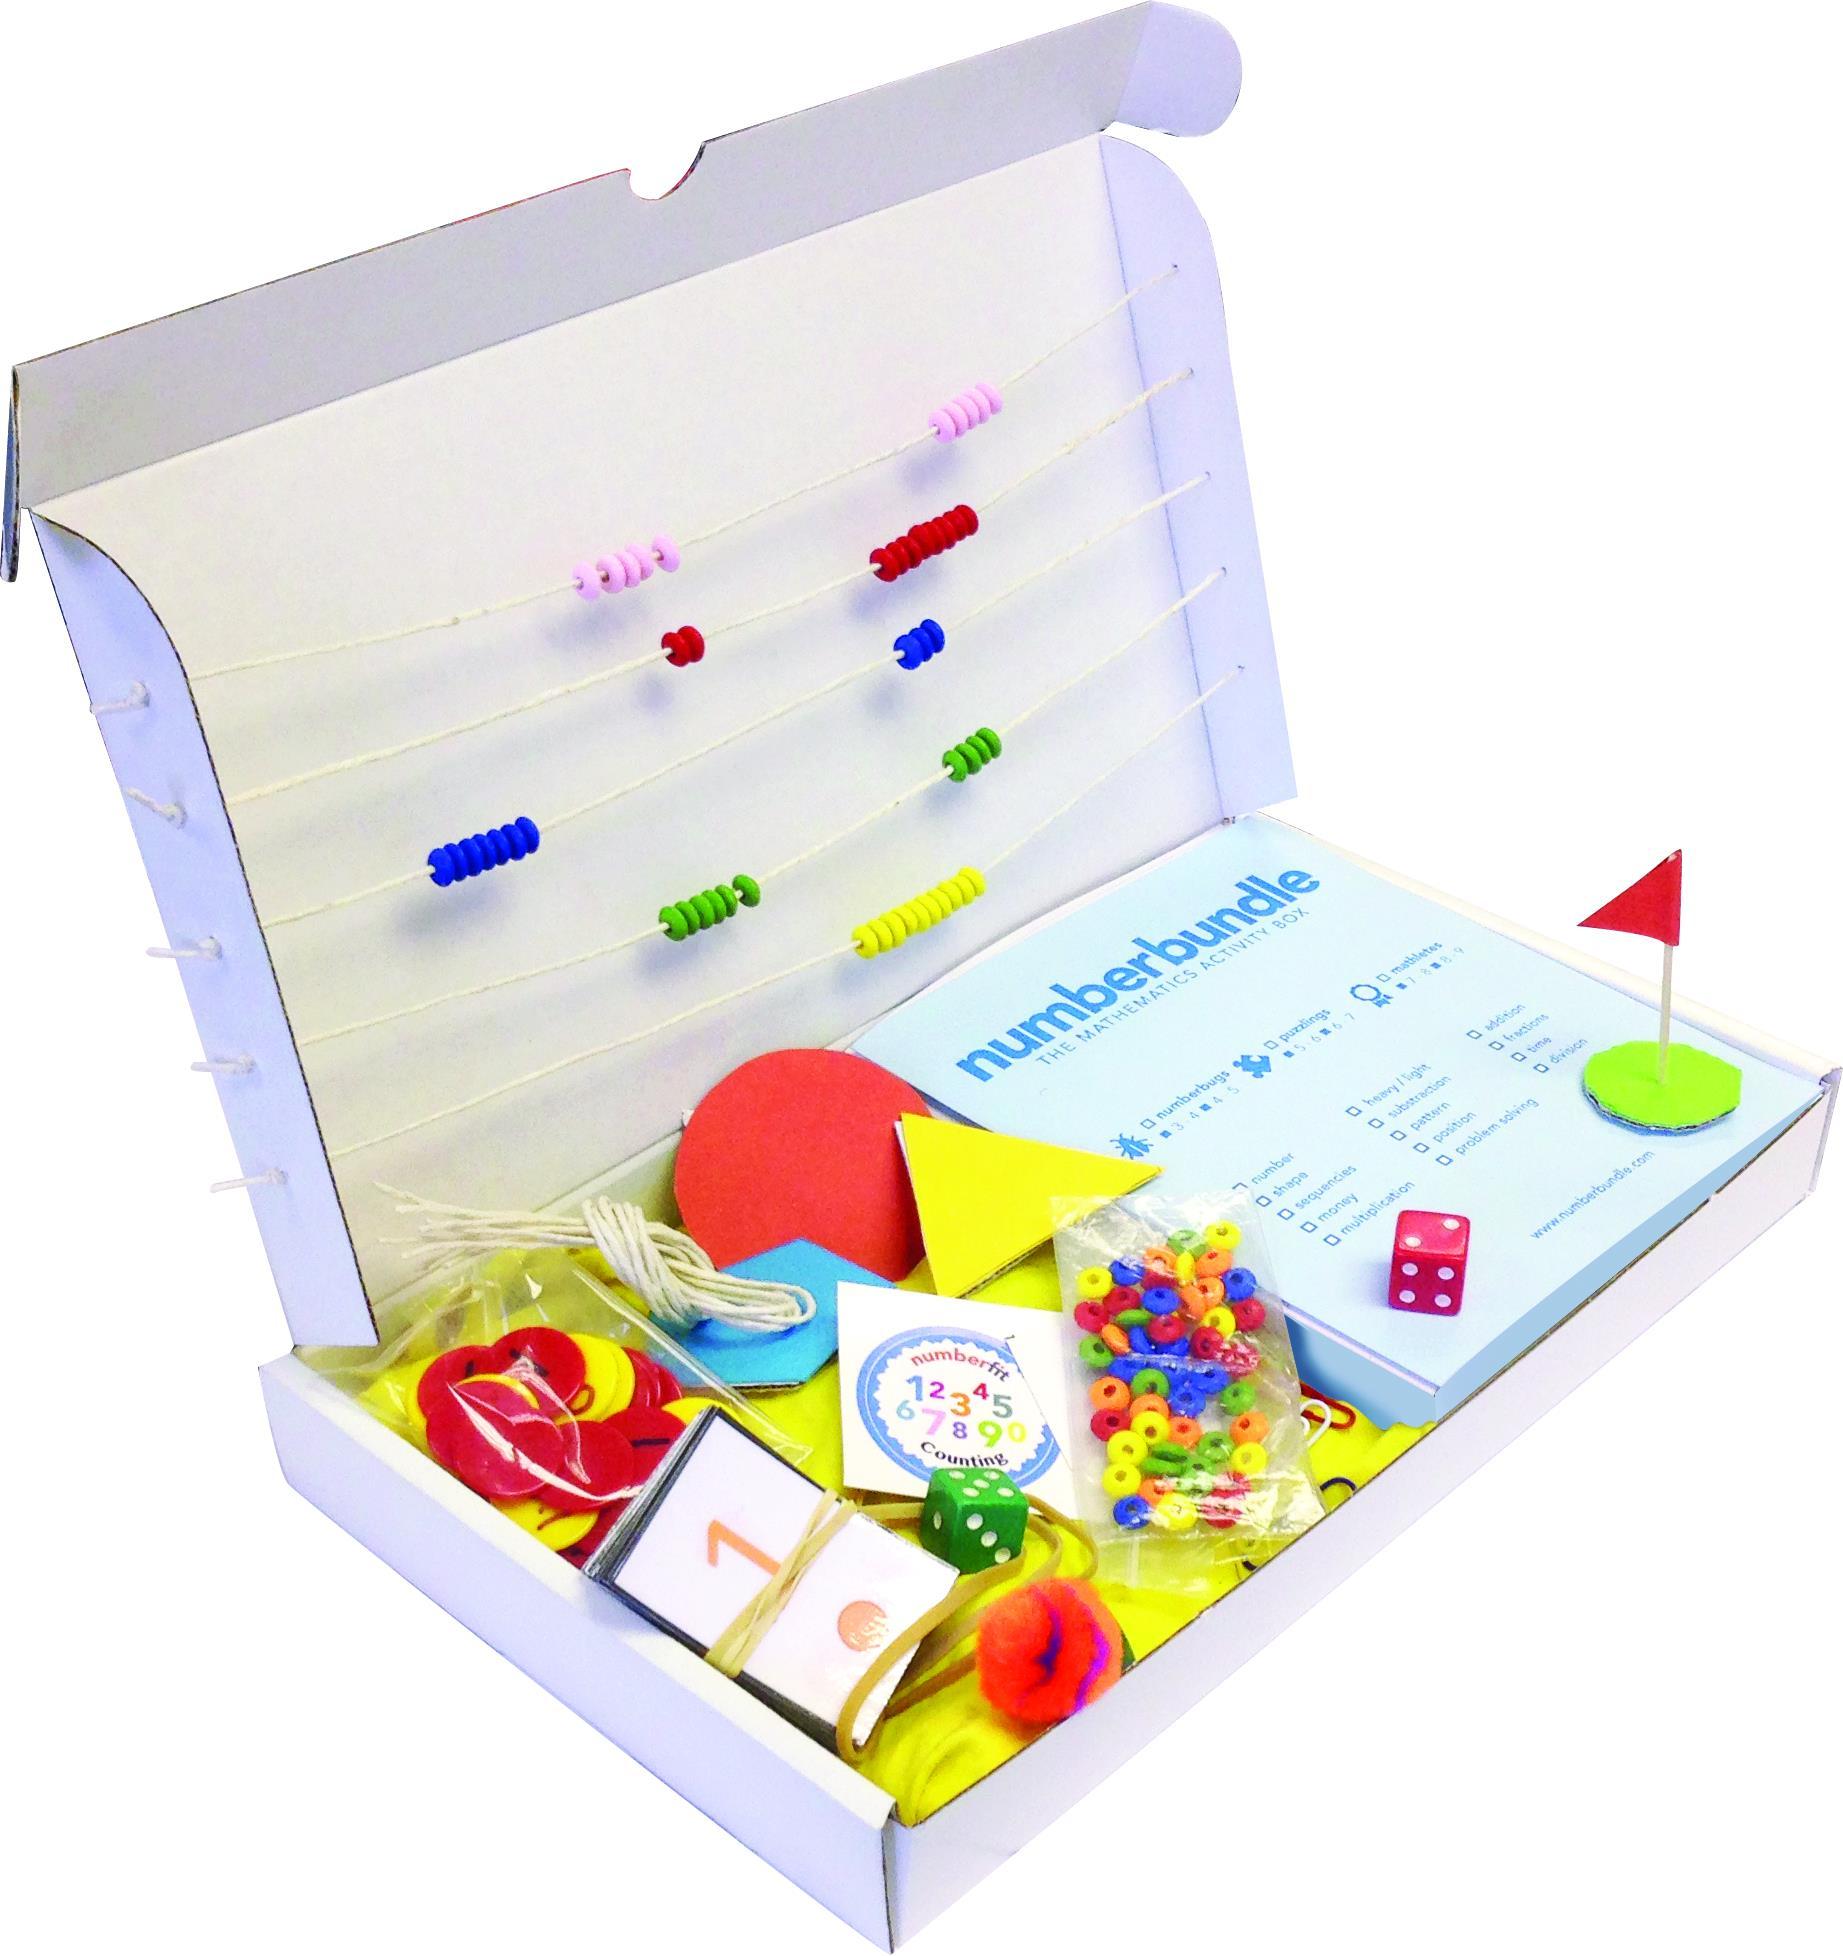 BOX_OPEN (2).jpg